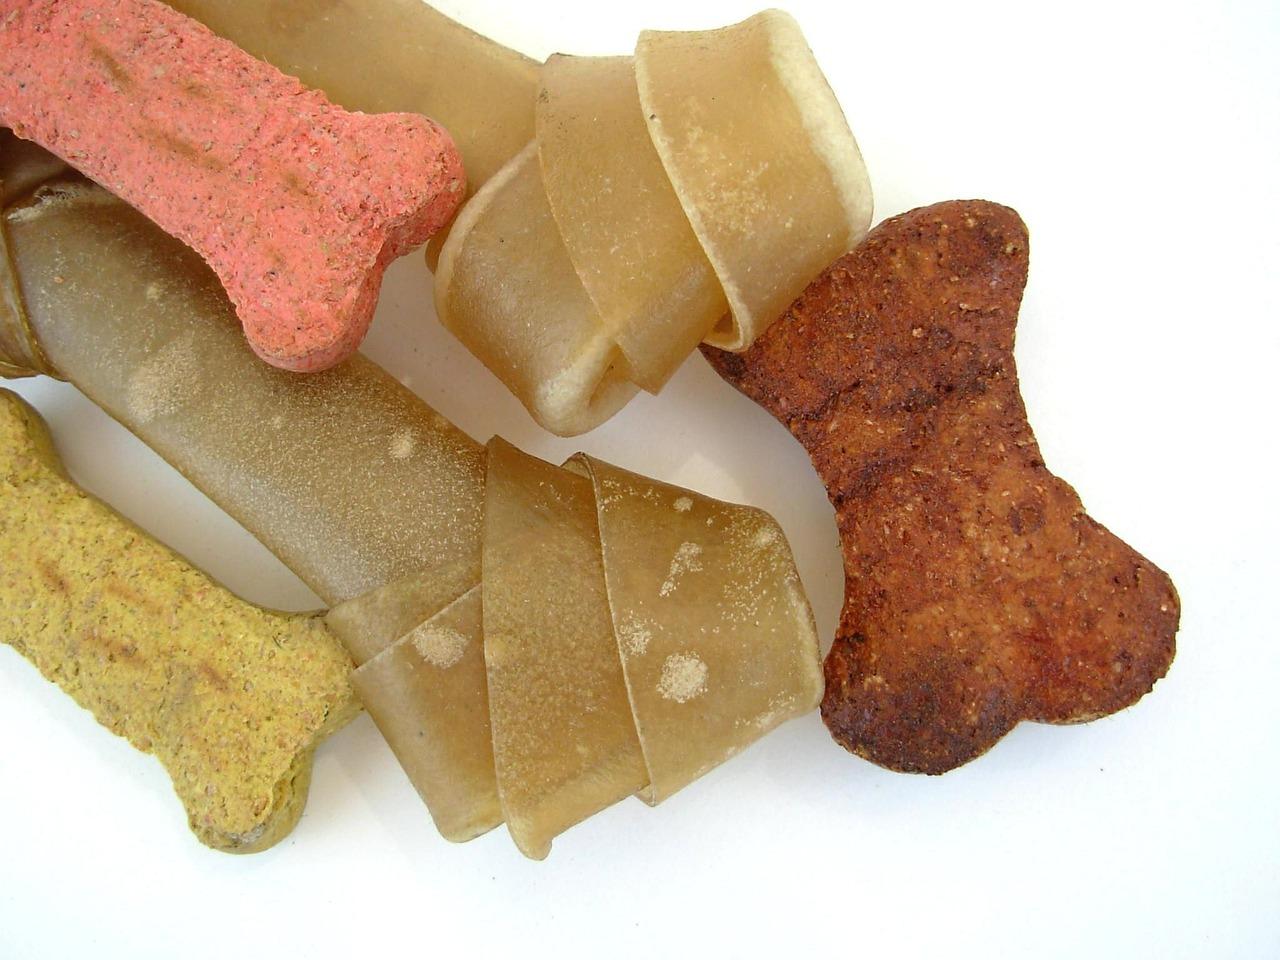 Advantage of grain-free dog food vs classical dog food